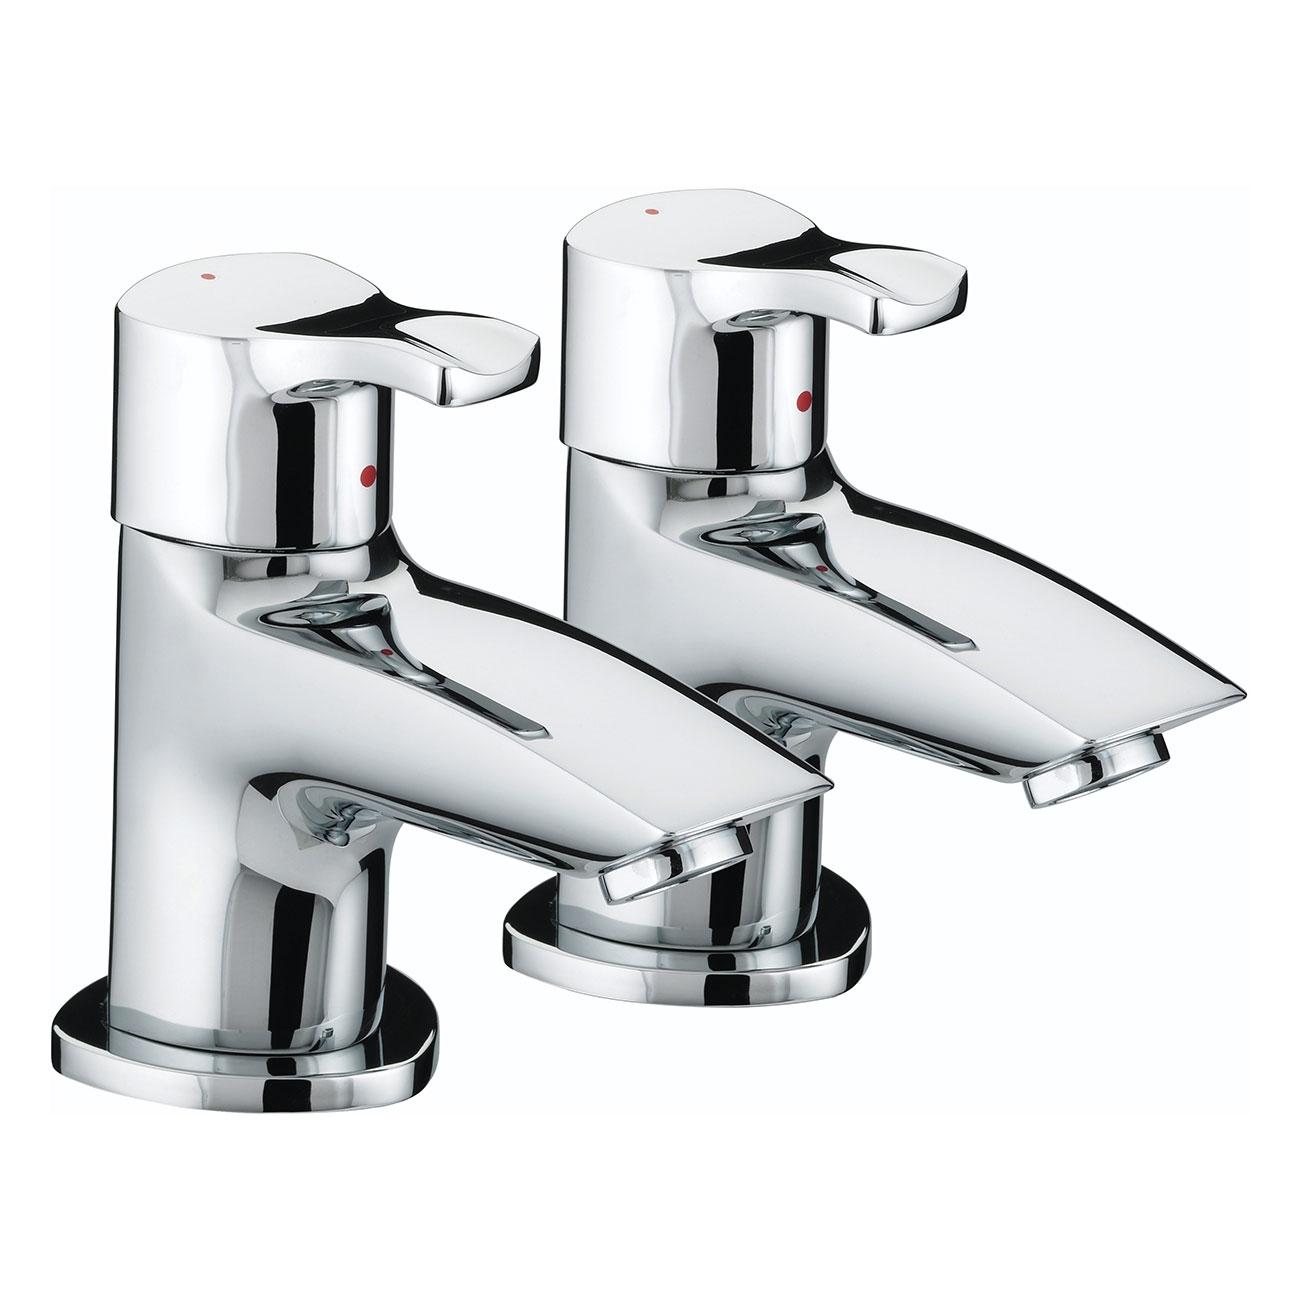 Bristan Capri Bath Taps - Chrome Plated